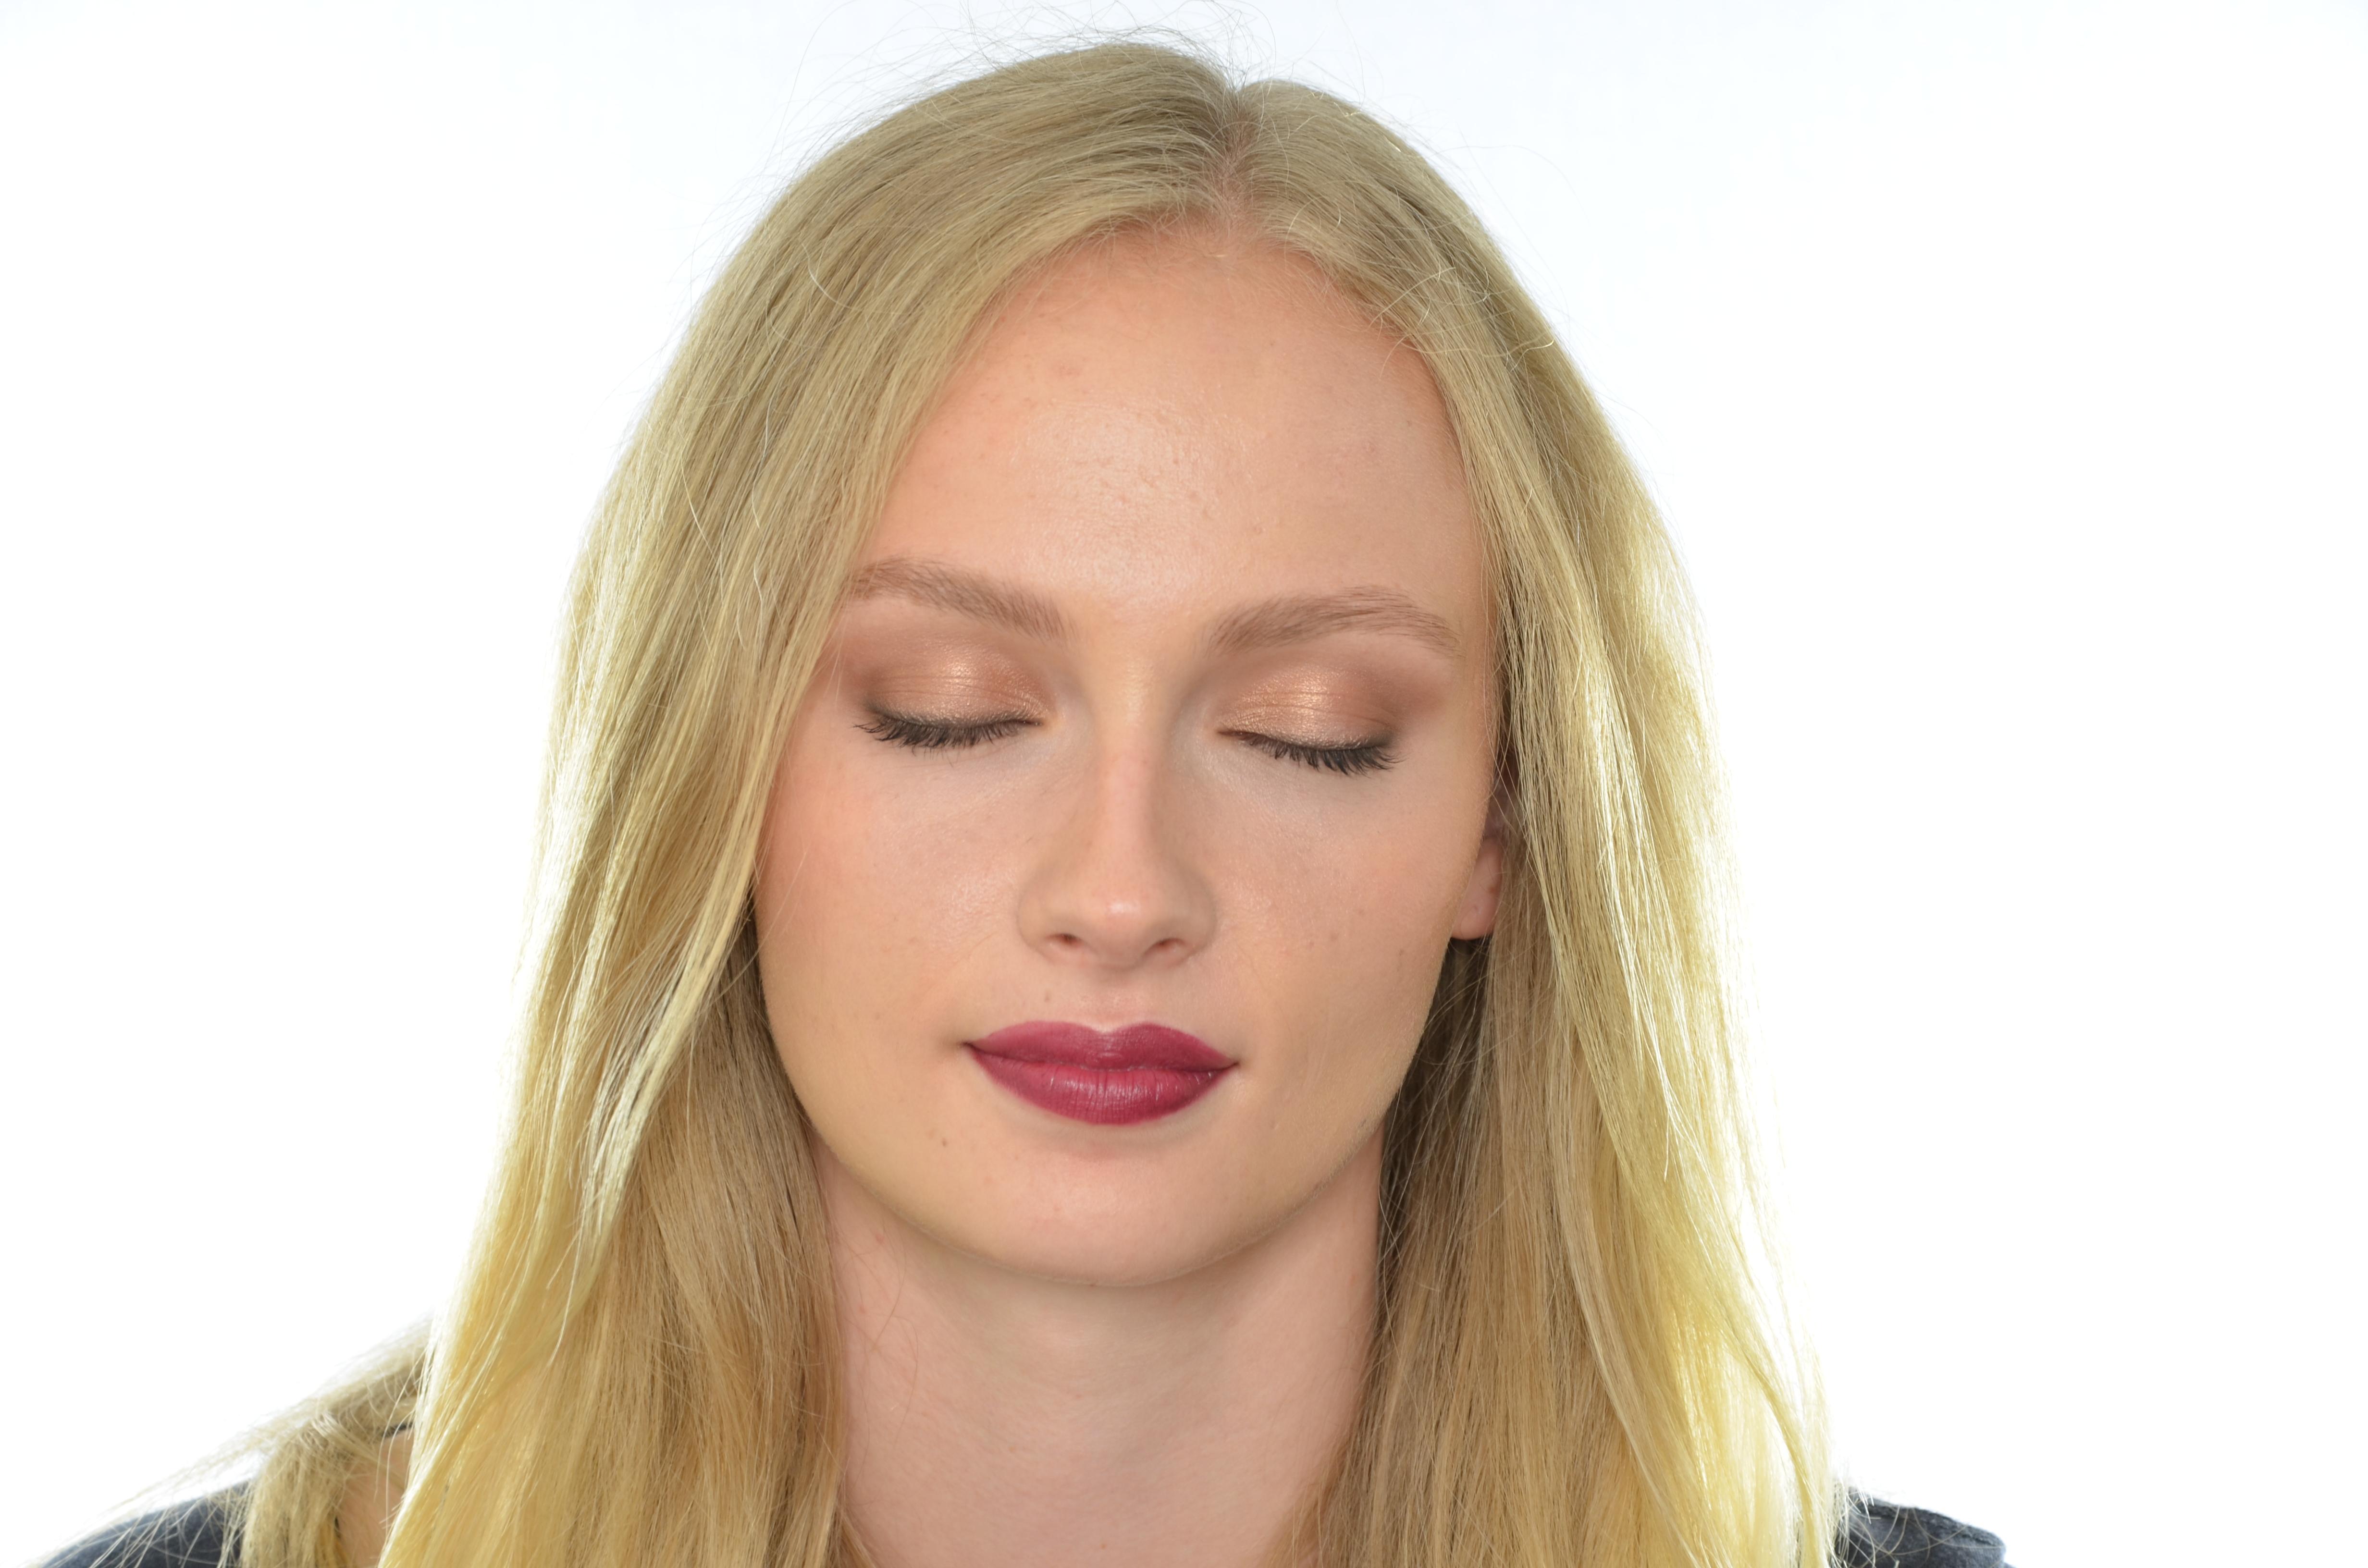 burgundy_lips__#2